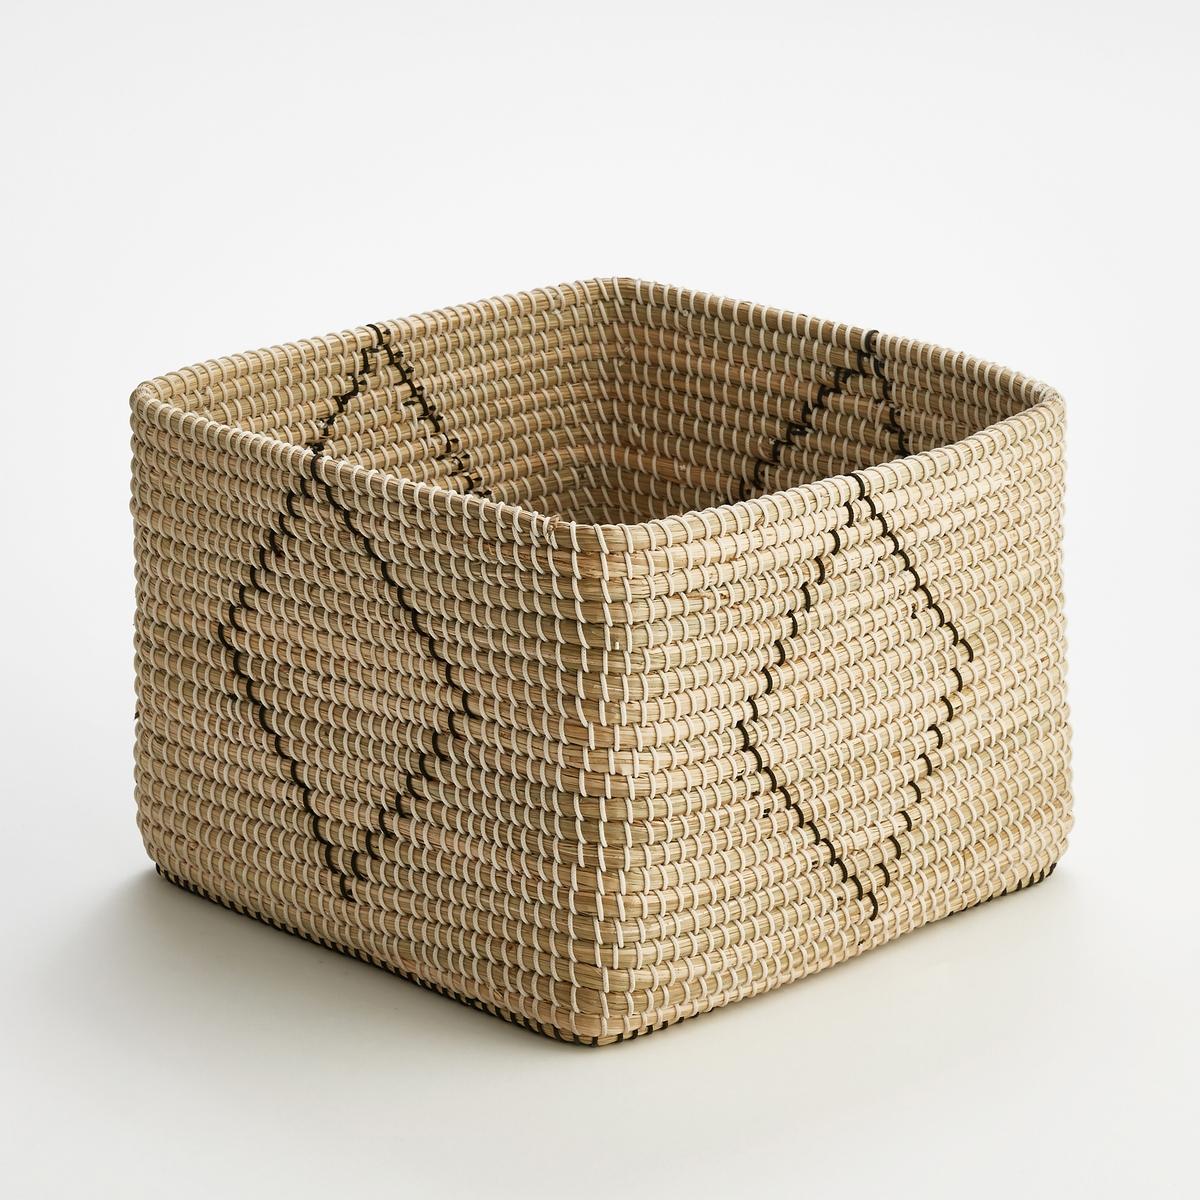 Корзина плетеная квадратная Guillermo jd коллекция квадратная корзина стандарт